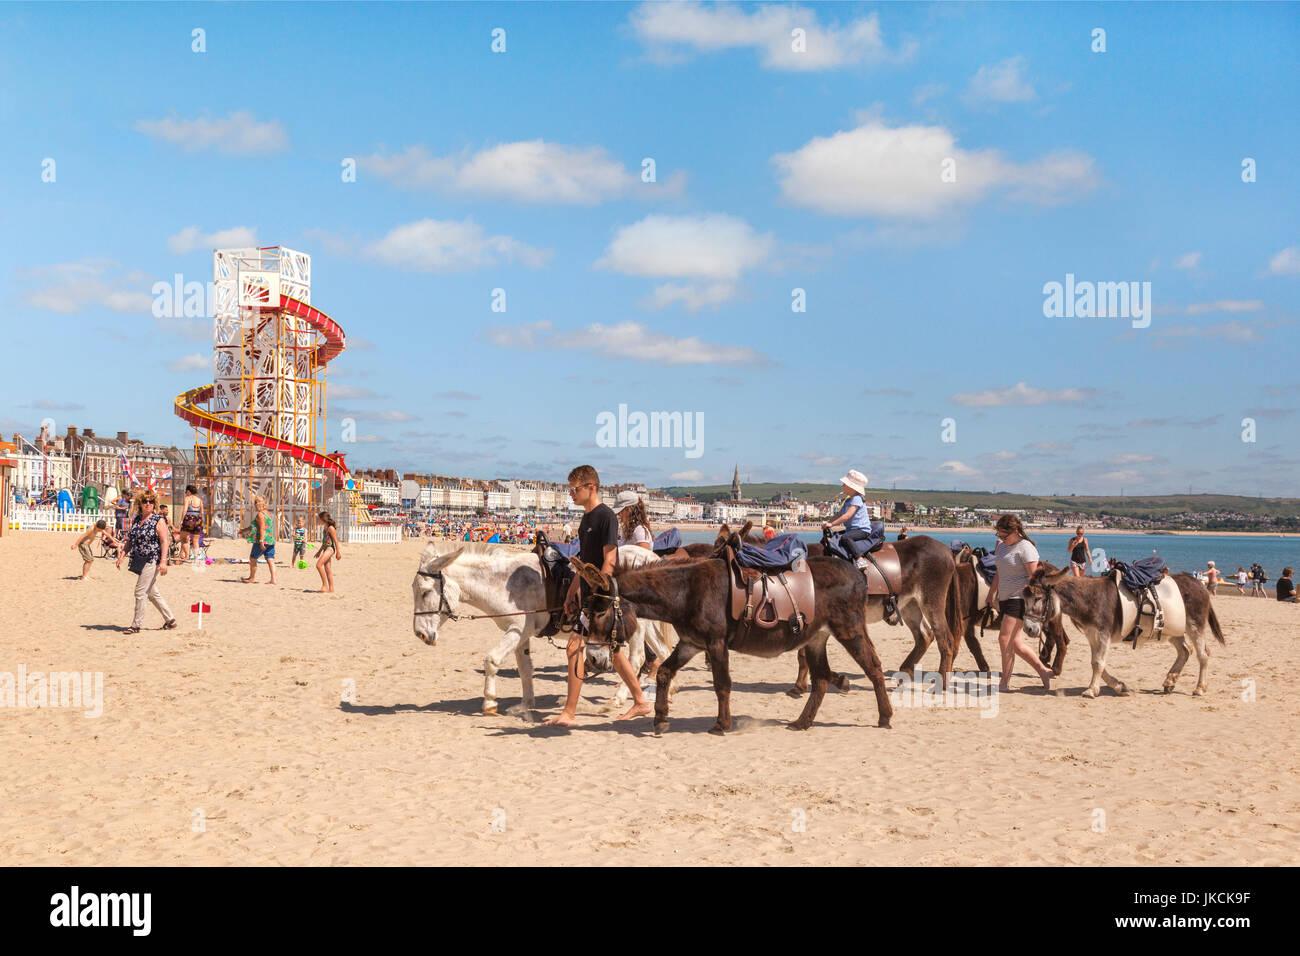 2 Juillet 2017: Weymouth, Dorset, England, UK - âne sur la plage de Weymouth, Dorset, Angleterre, Royaume Photo Stock